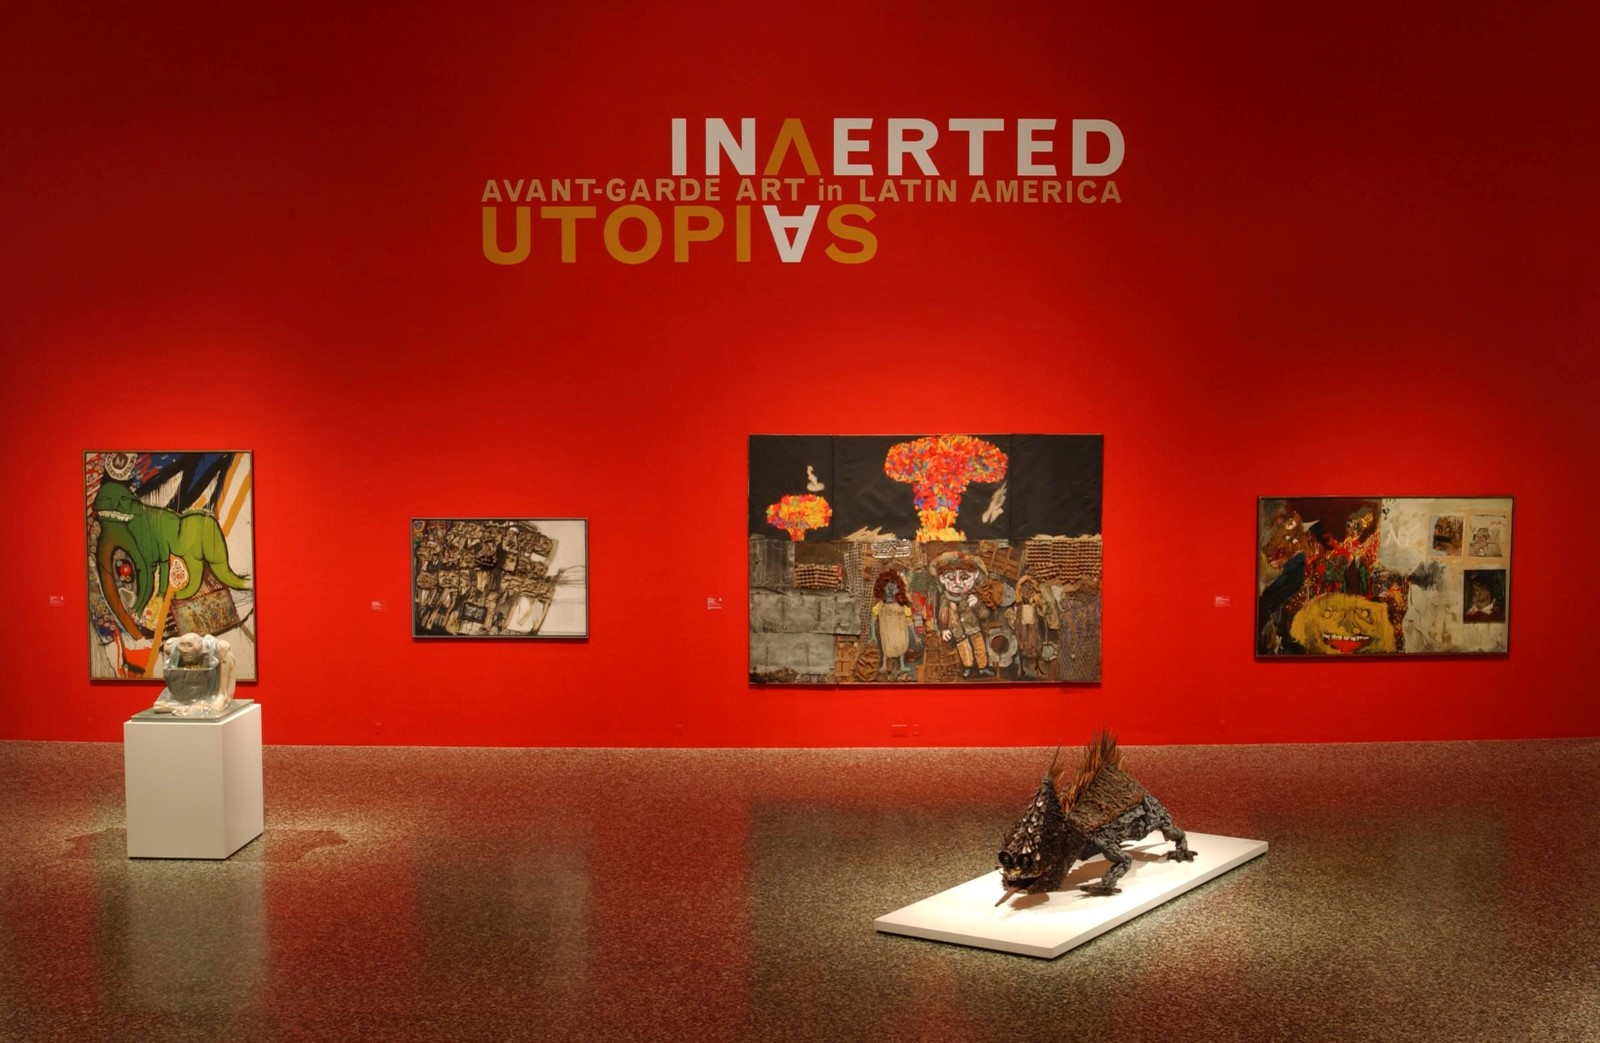 From  Inverted Utopias: Avant-Garde Art in Latin America